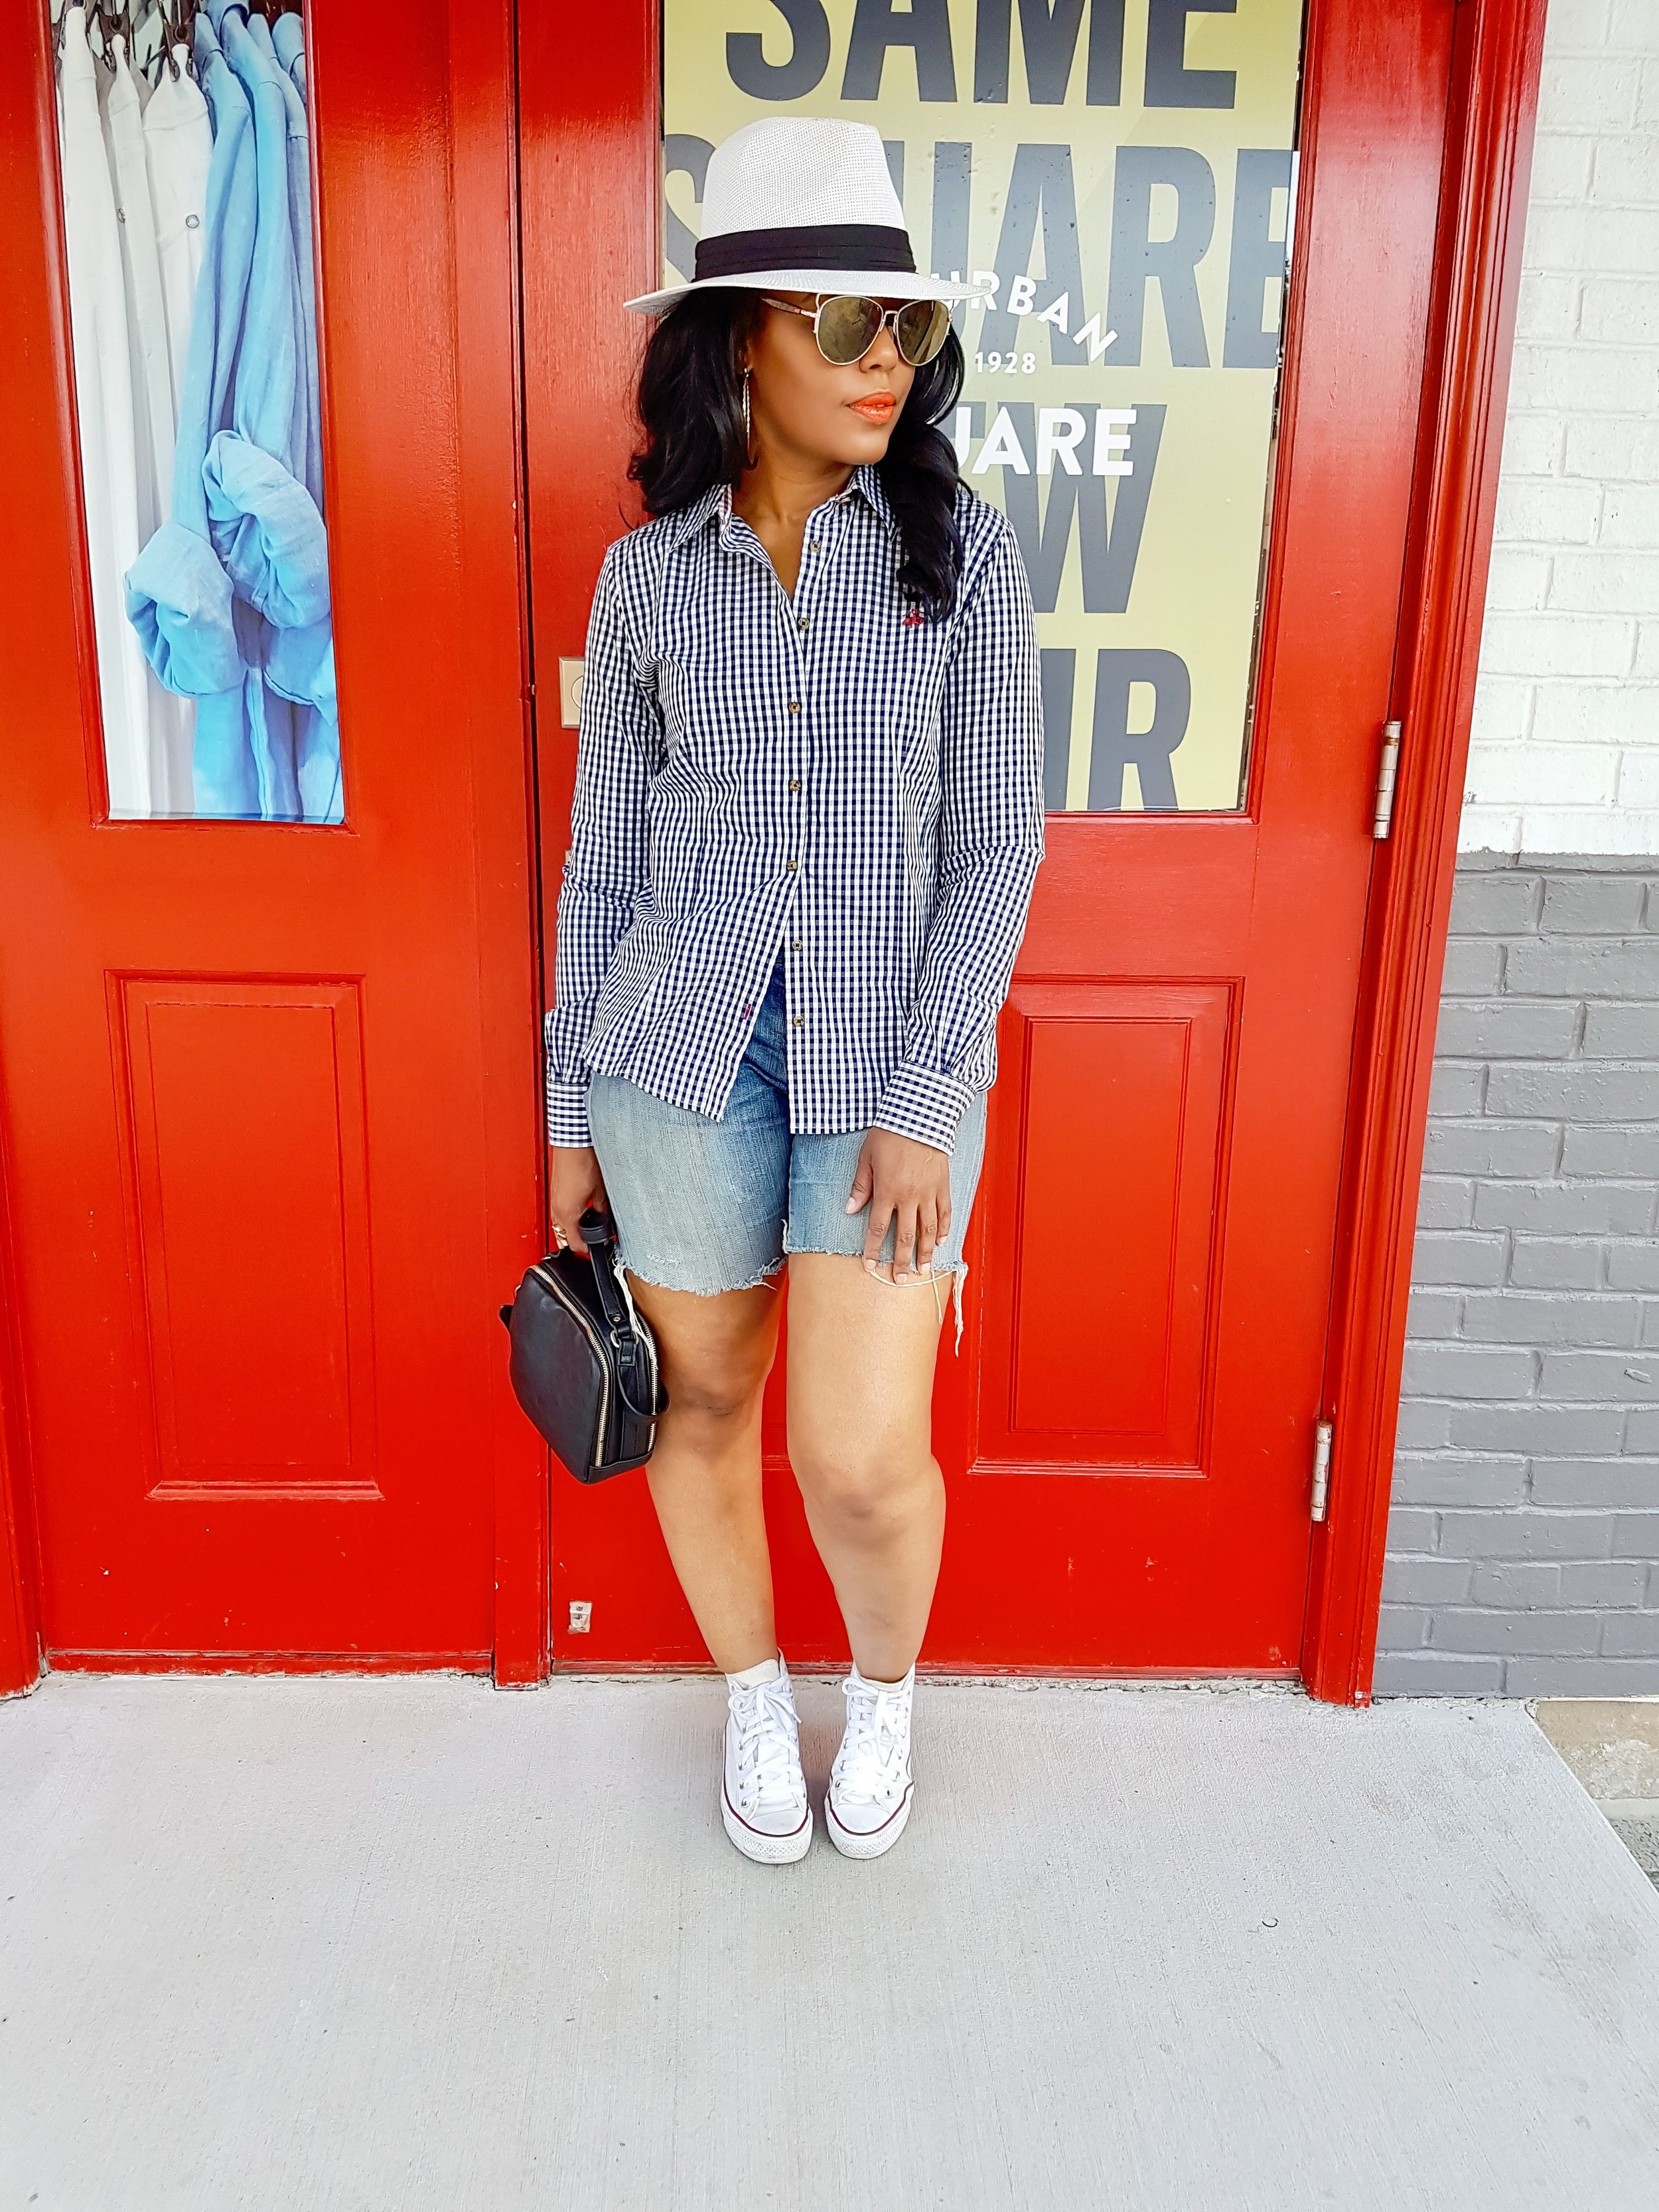 Jeans:DIY cut offs; Button down (thrift find); Hat (old); Sneaker (Converse)